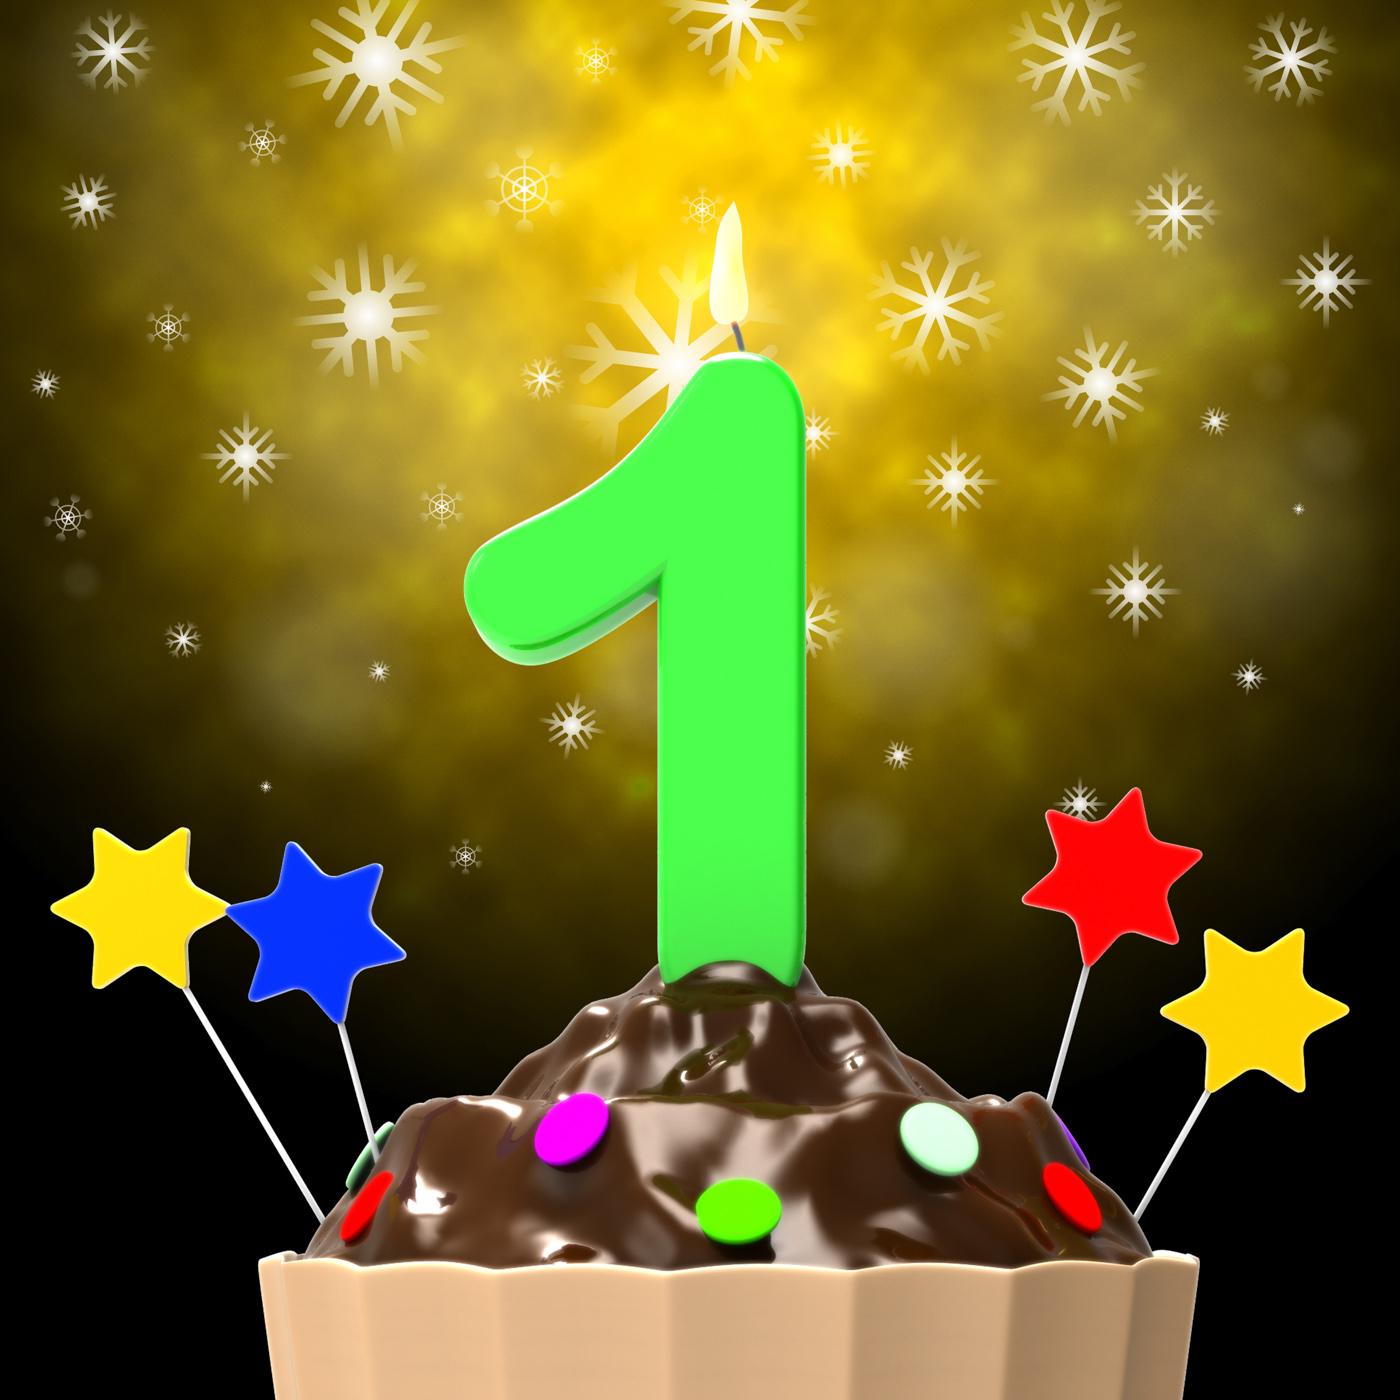 One celebration indicates happy birthday and 1 photo